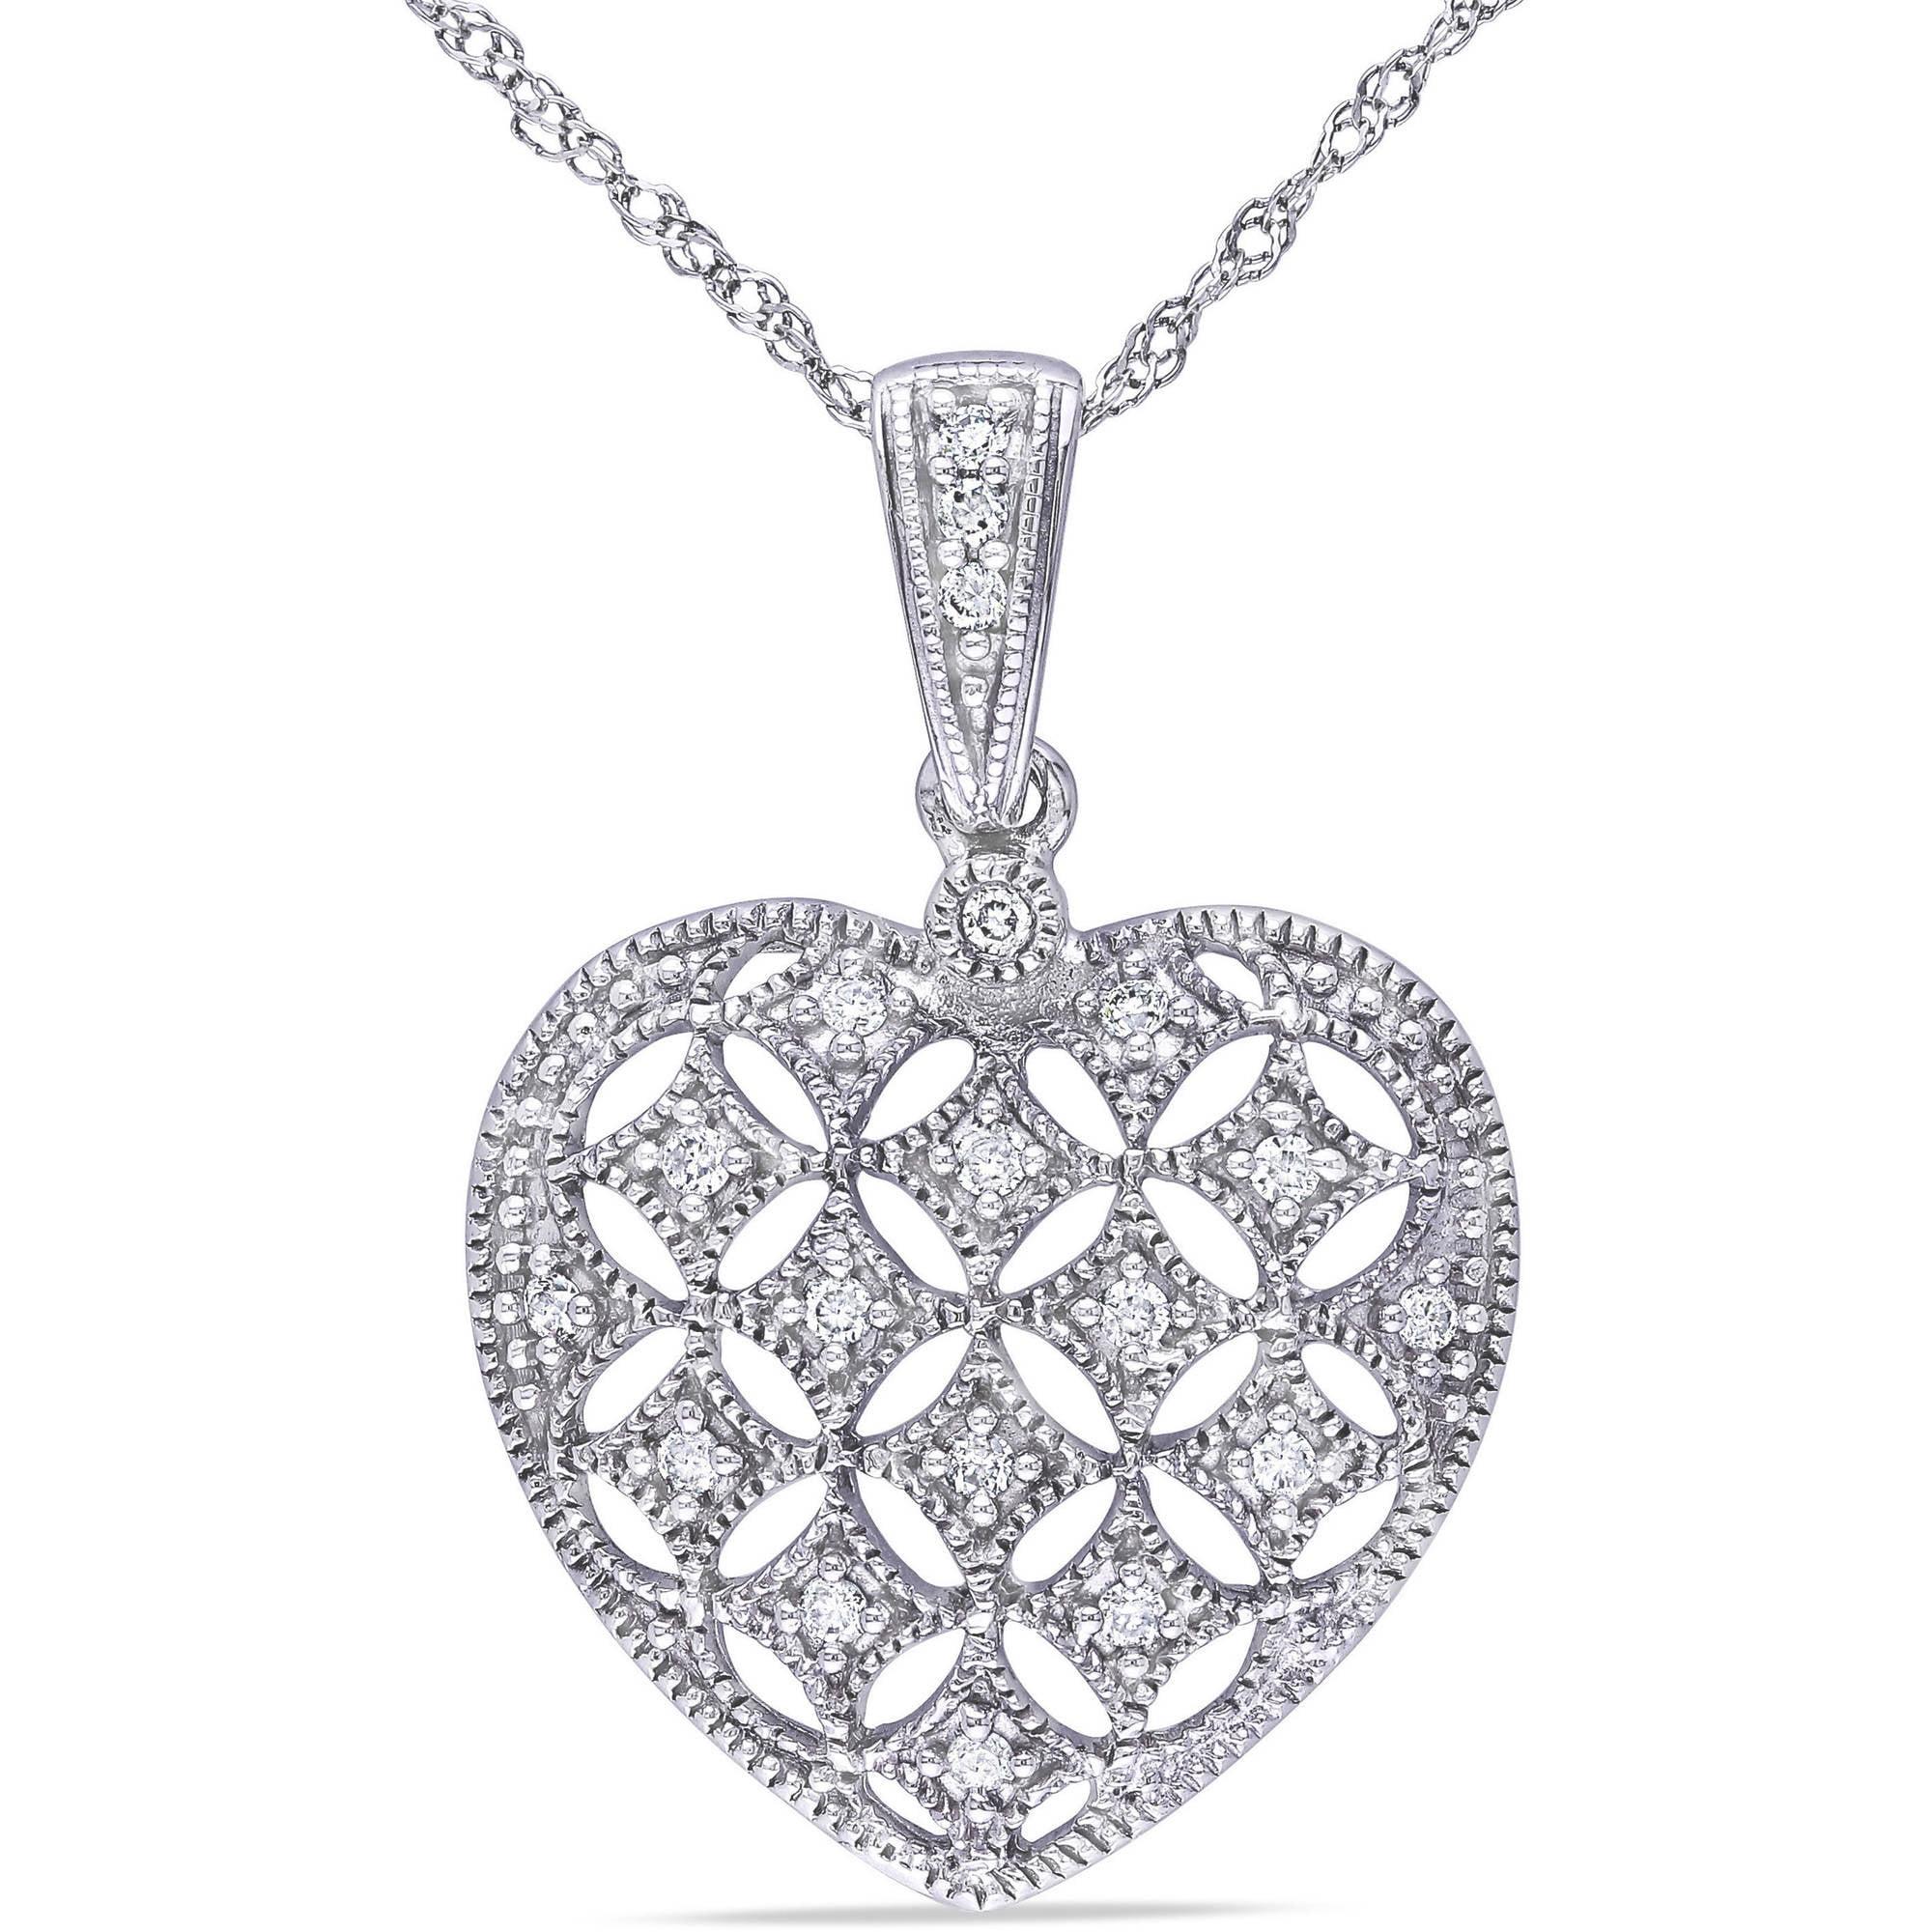 Miabella 1 7 Carat T.W. Diamond 14kt White Gold Heart Pendant by Delmar Manufacturing LLC